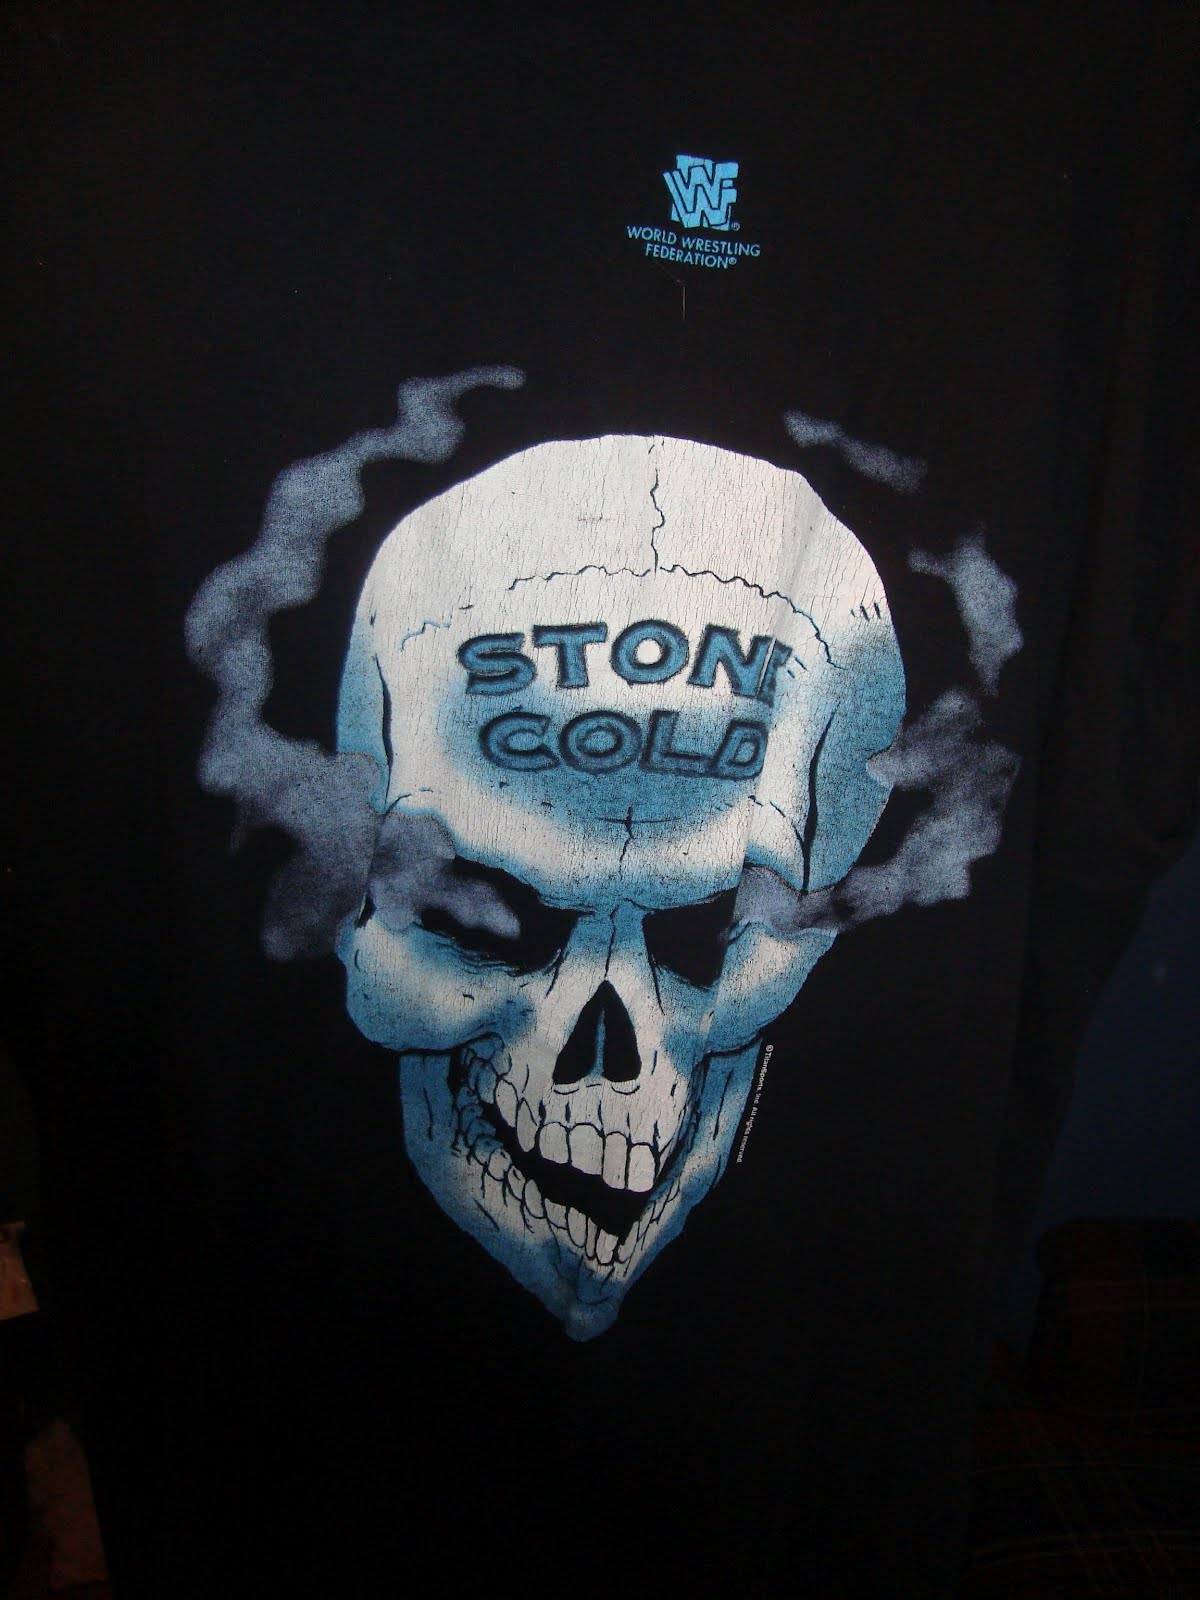 Stone Cold Steve Austin Wallpaper Hd